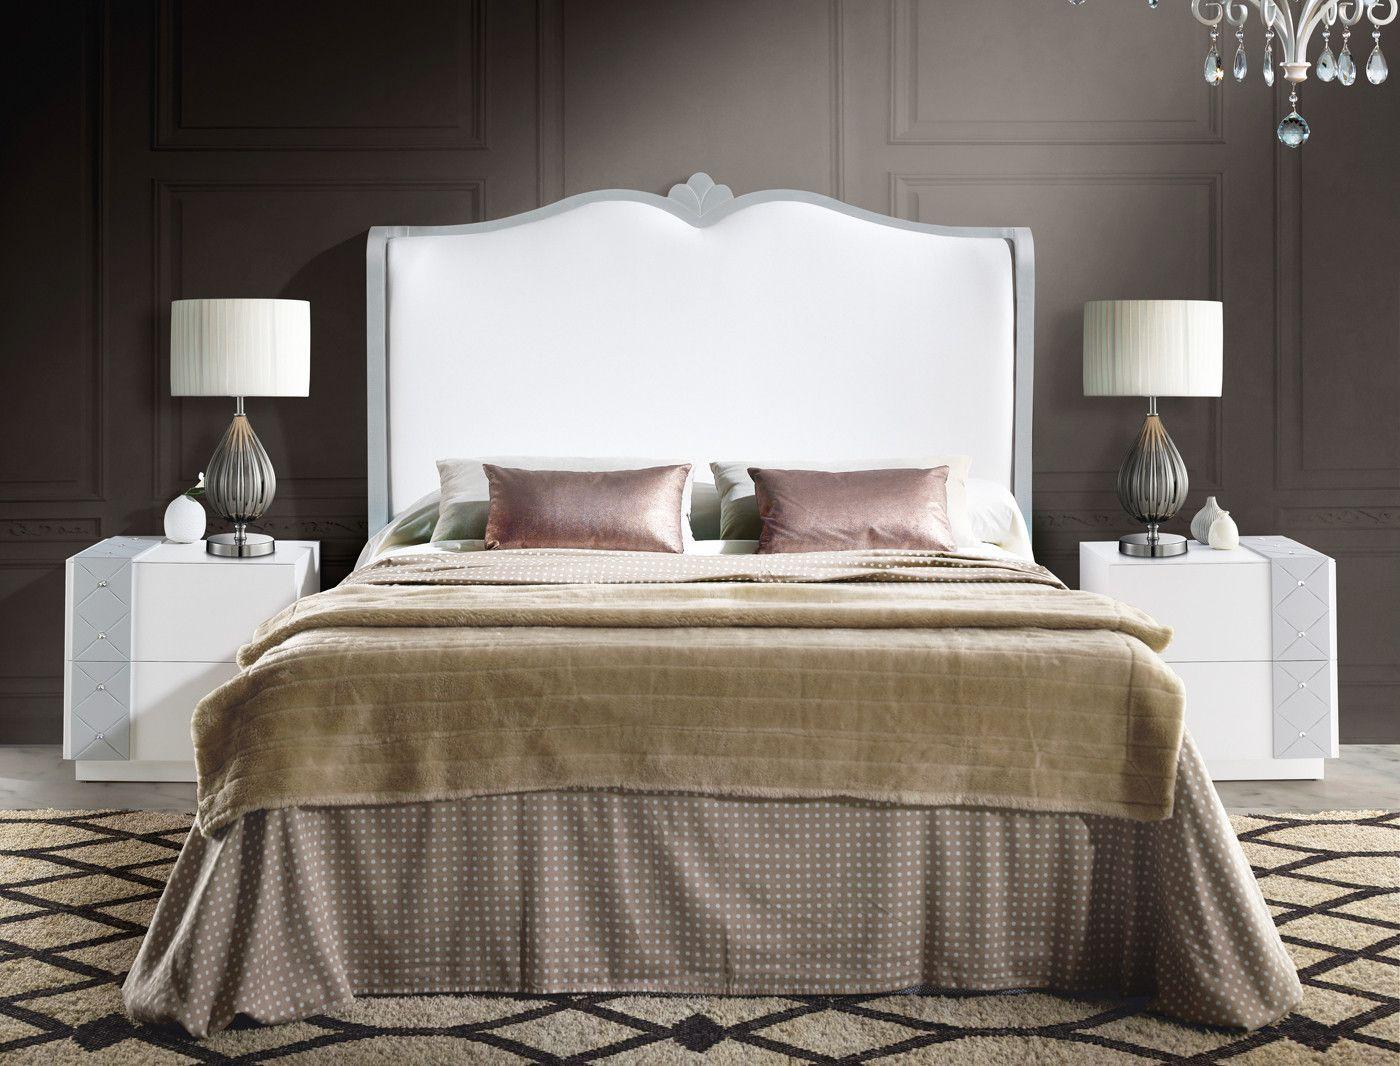 Muebles dormitorio cabecero clásico tapizado - dm | Camas de ...